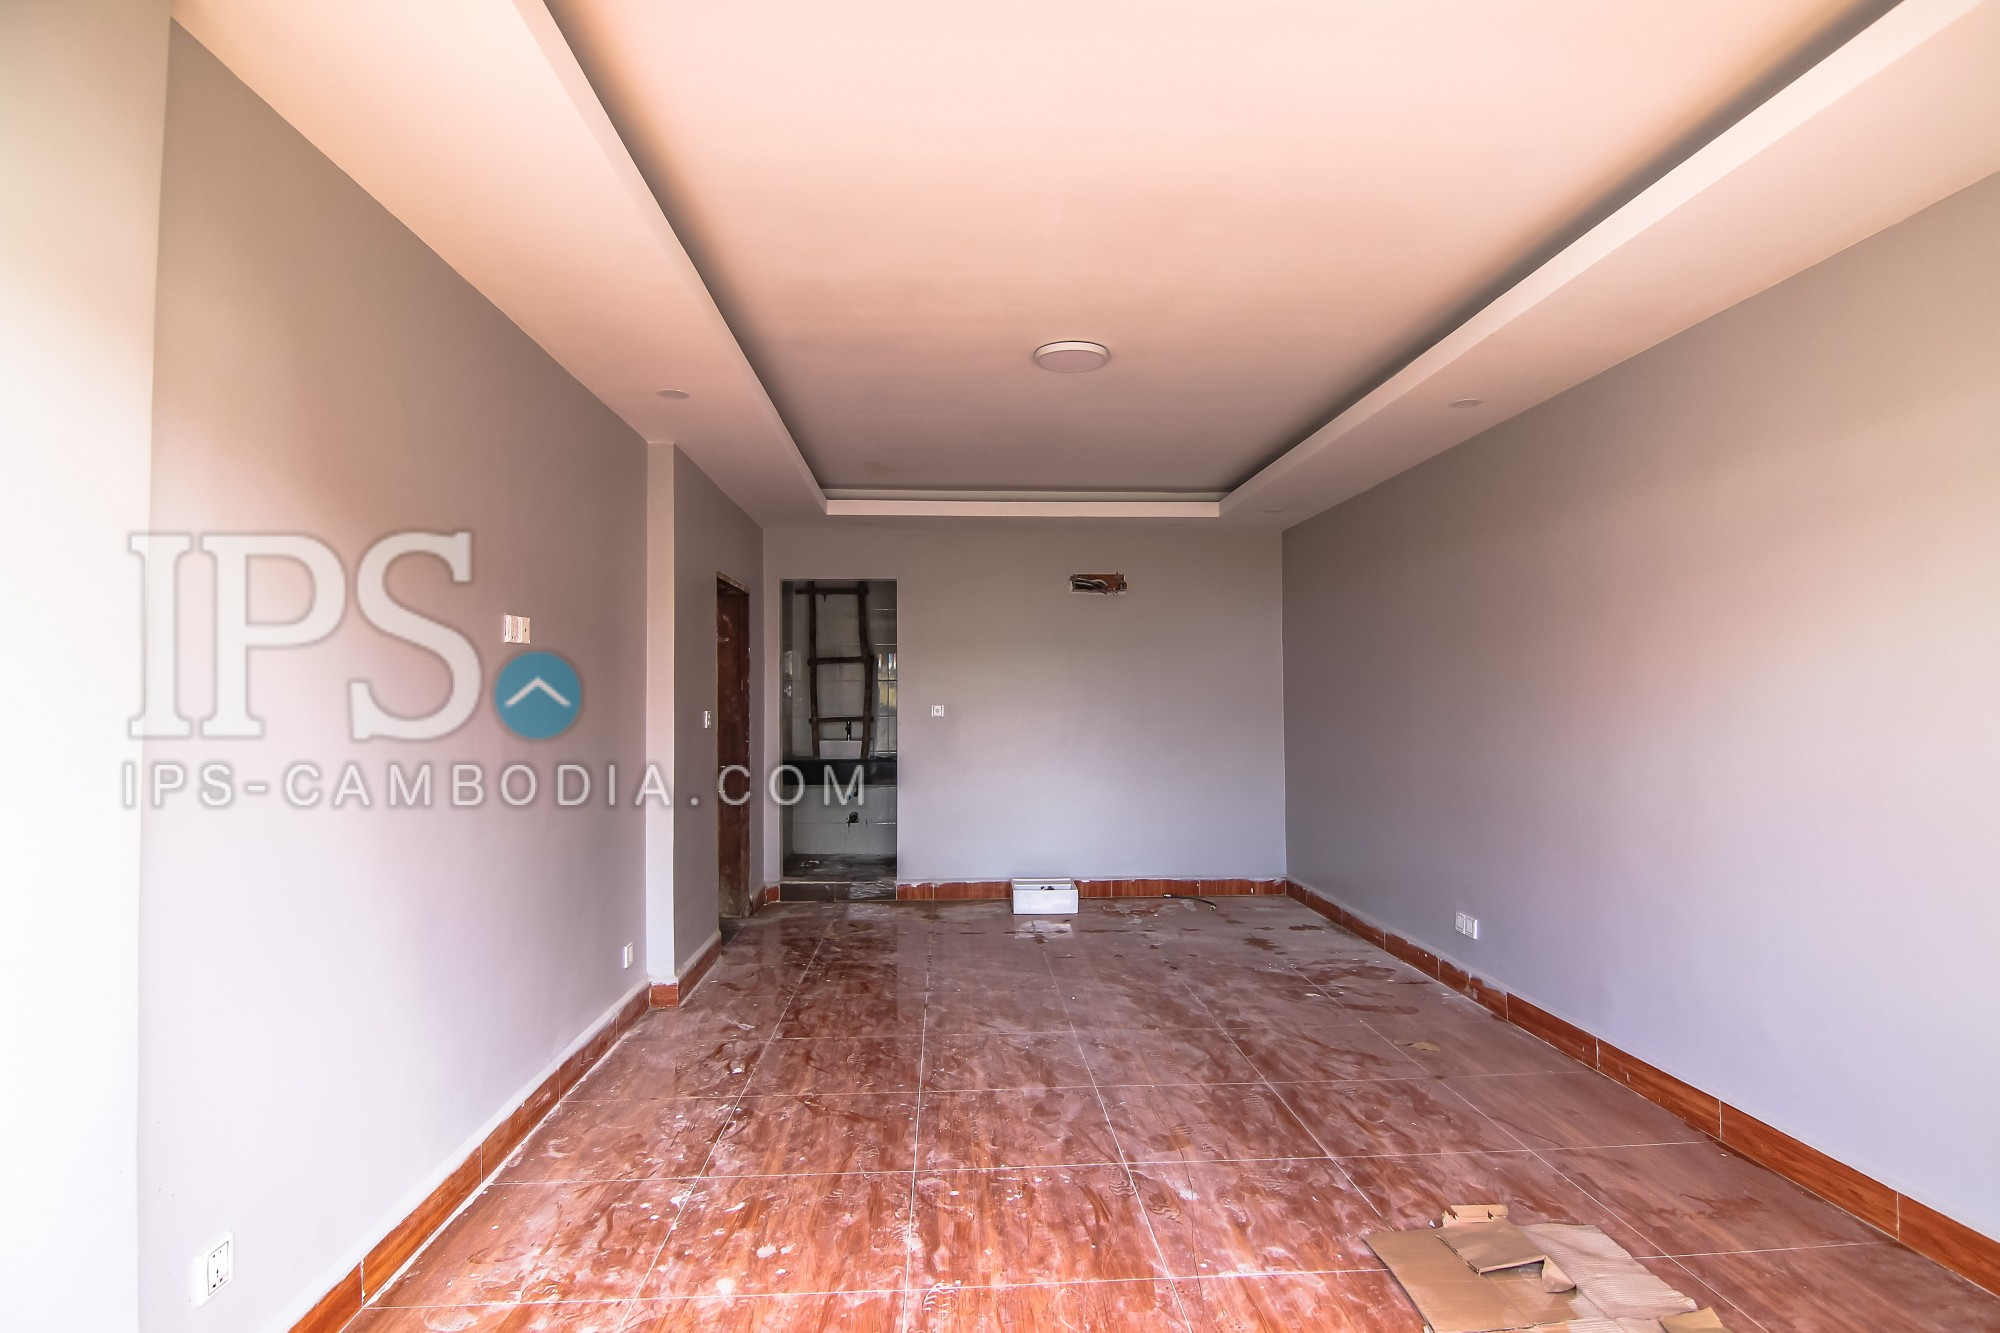 469 sqm Land and Villa For Sale - Phsar Derm Thkov